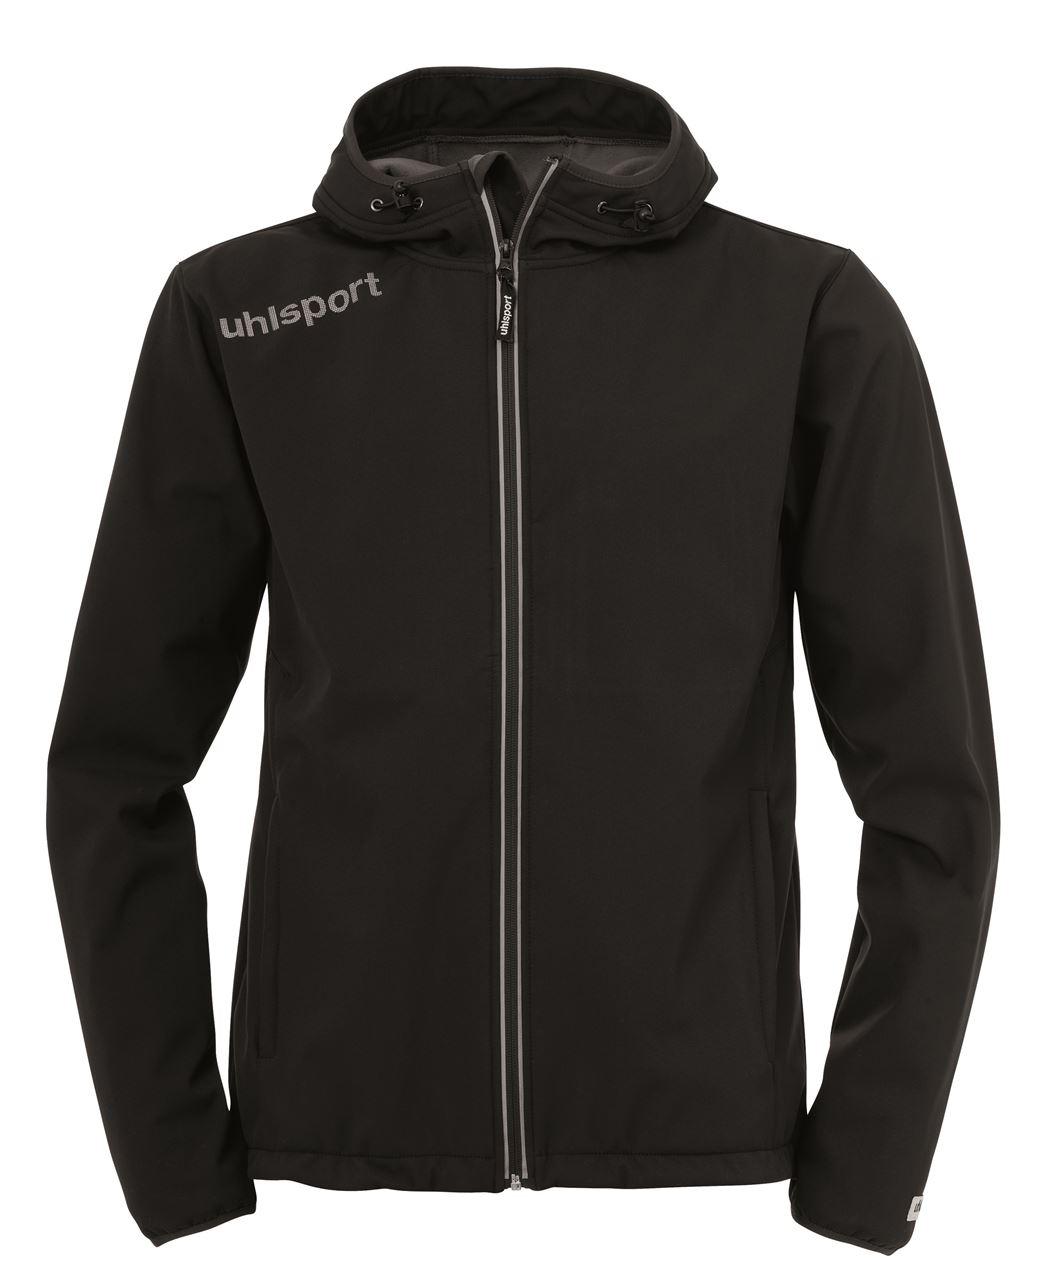 Uhlsport Essential Softshell Jacket 1003247